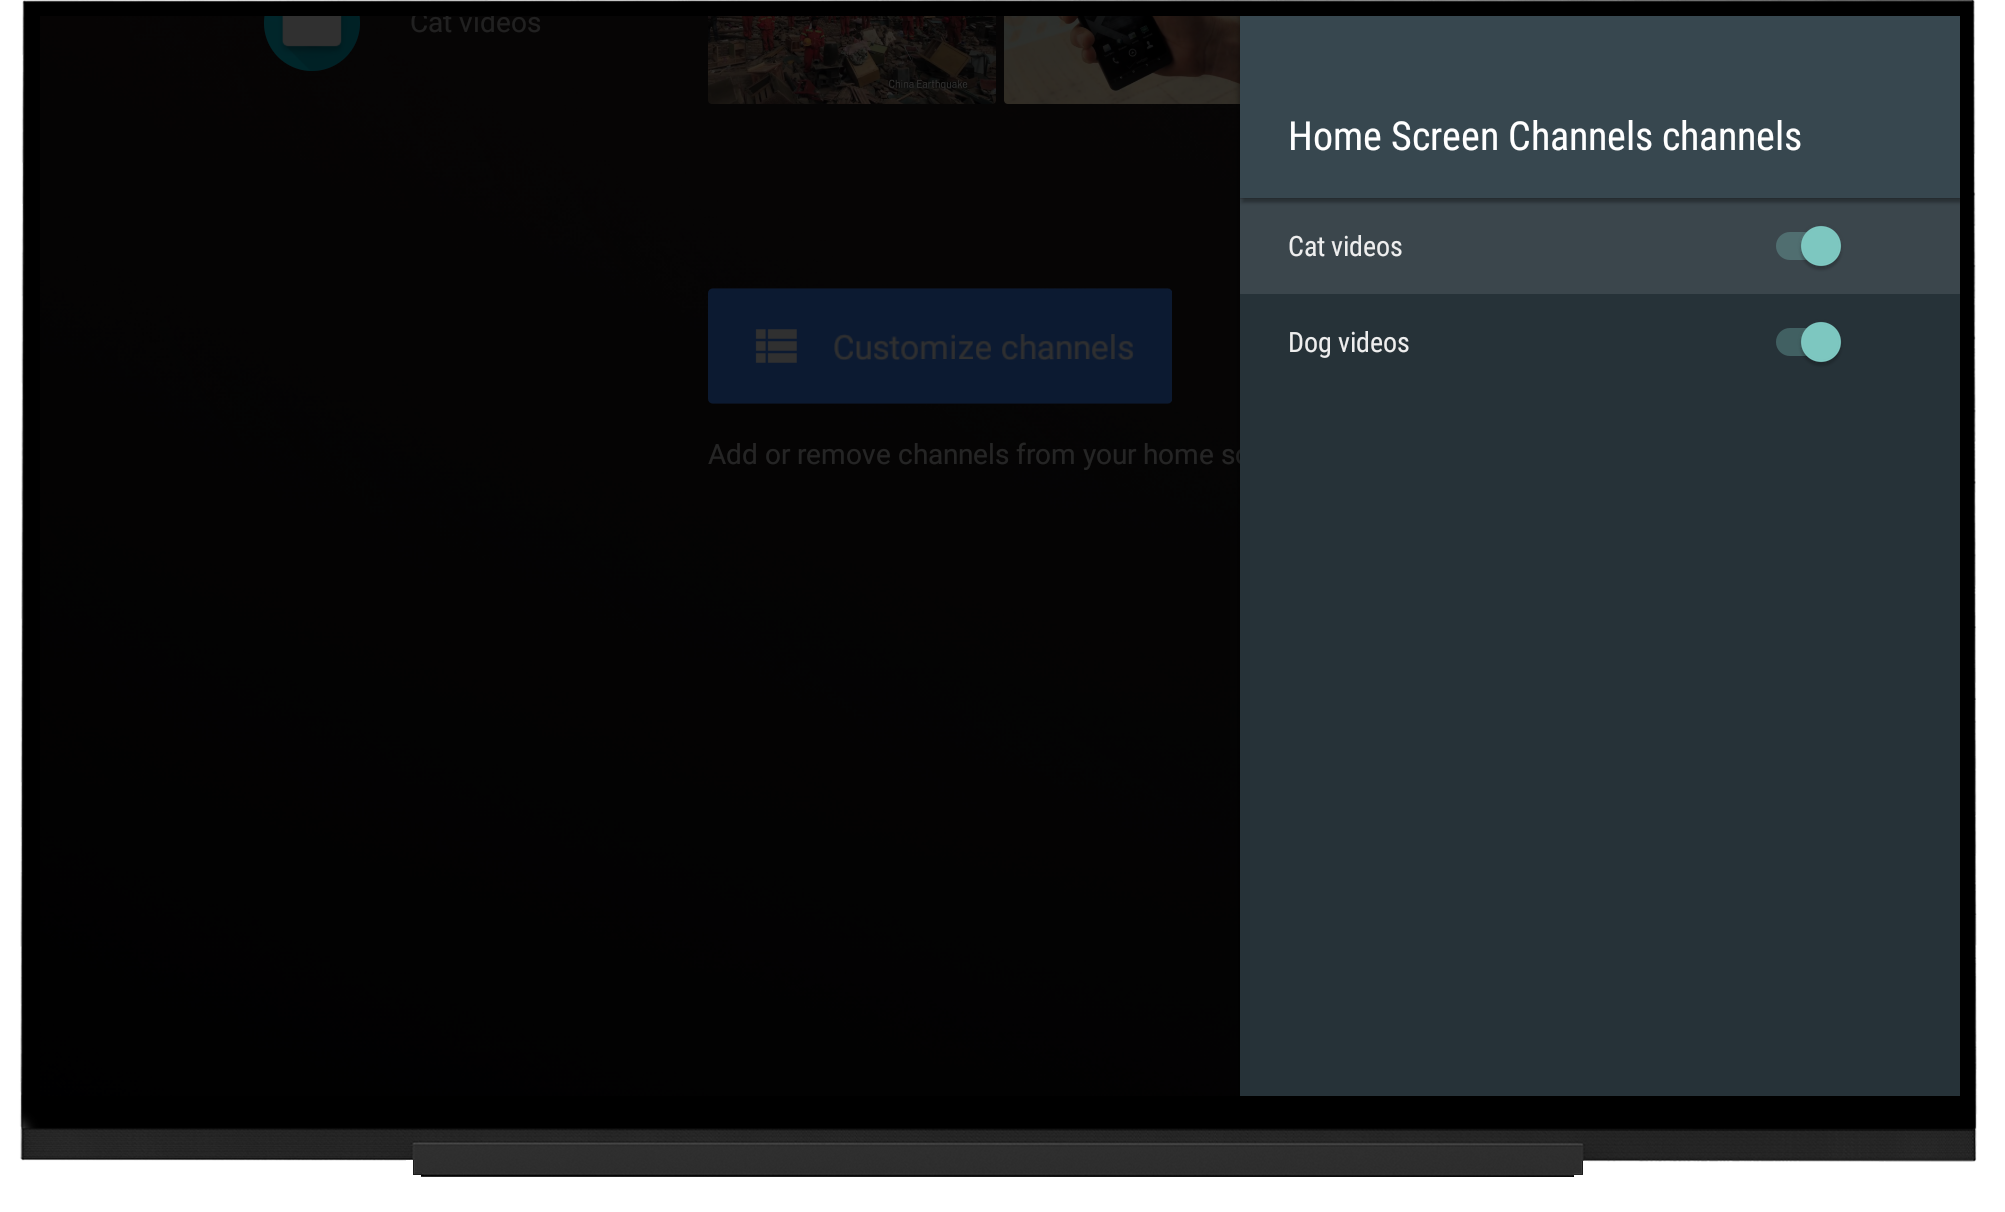 GitHub - googlesamples/leanback-homescreen-channels: A sample that